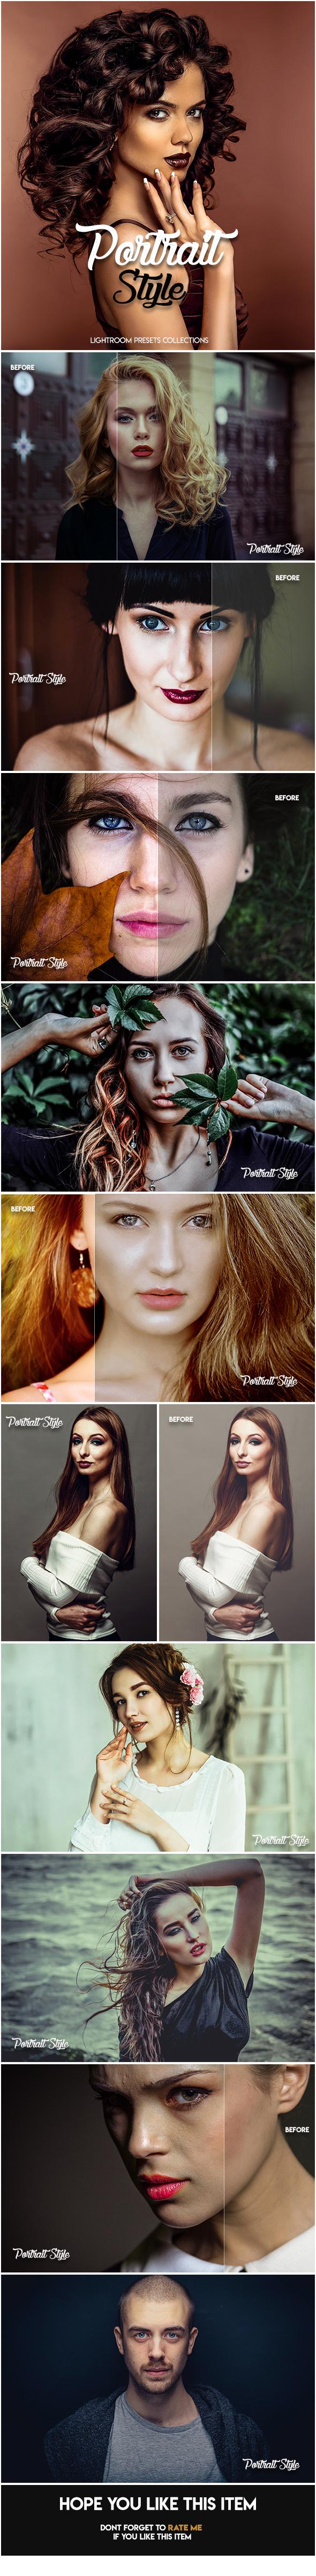 GraphicRiver Portrait Style LightRoom Preset 20620065